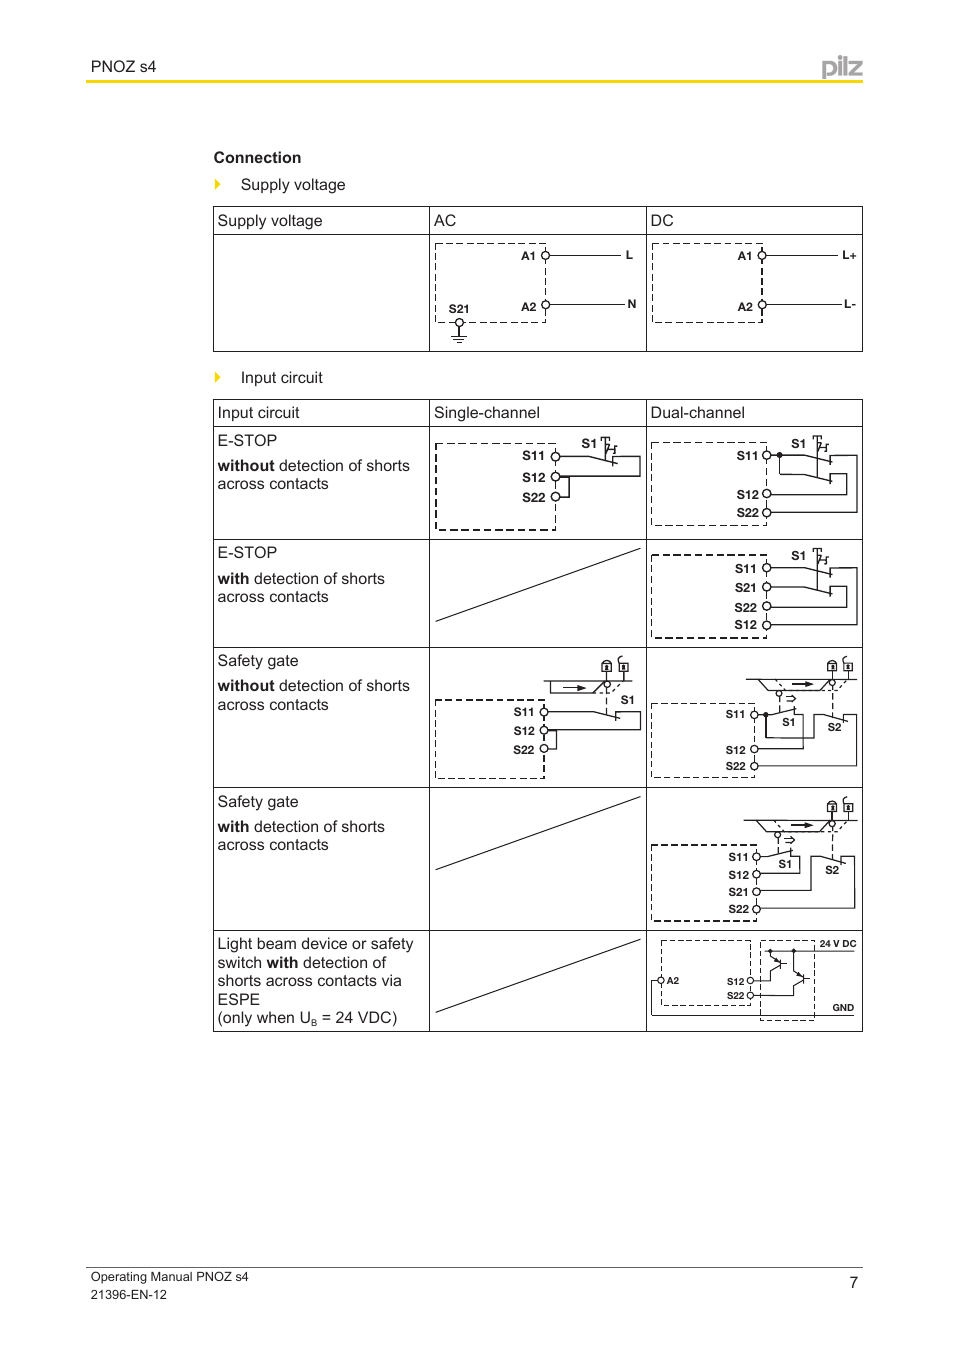 pilz-pnoz-s4-c-48-240vacdc-3-n_o-1-n_c-page7 Pilz Pnoz Wiring Diagram on friendship bracelet diagrams, gmc fuse box diagrams, electrical diagrams, lighting diagrams, engine diagrams, hvac diagrams, honda motorcycle repair diagrams, troubleshooting diagrams, motor diagrams, pinout diagrams, smart car diagrams, switch diagrams, internet of things diagrams, transformer diagrams, electronic circuit diagrams, series and parallel circuits diagrams, led circuit diagrams, battery diagrams, sincgars radio configurations diagrams,